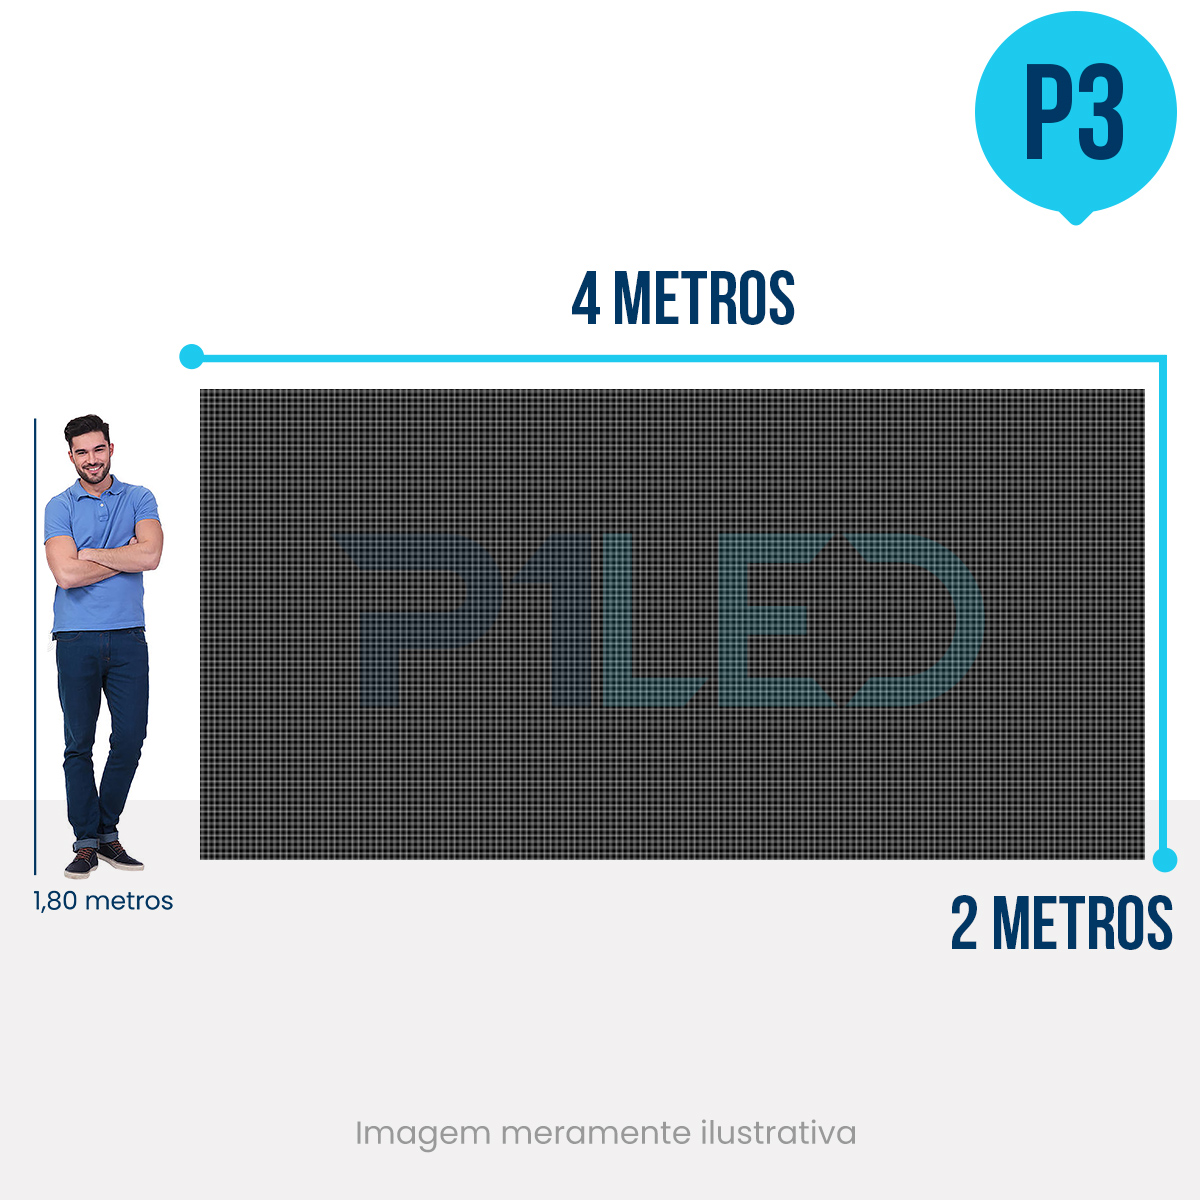 Painel de LED para Padaria 4x2 - Telão P3 Indoor  - Painel e Telão de LED - O Melhor Preço em Painel de LED | P1LED